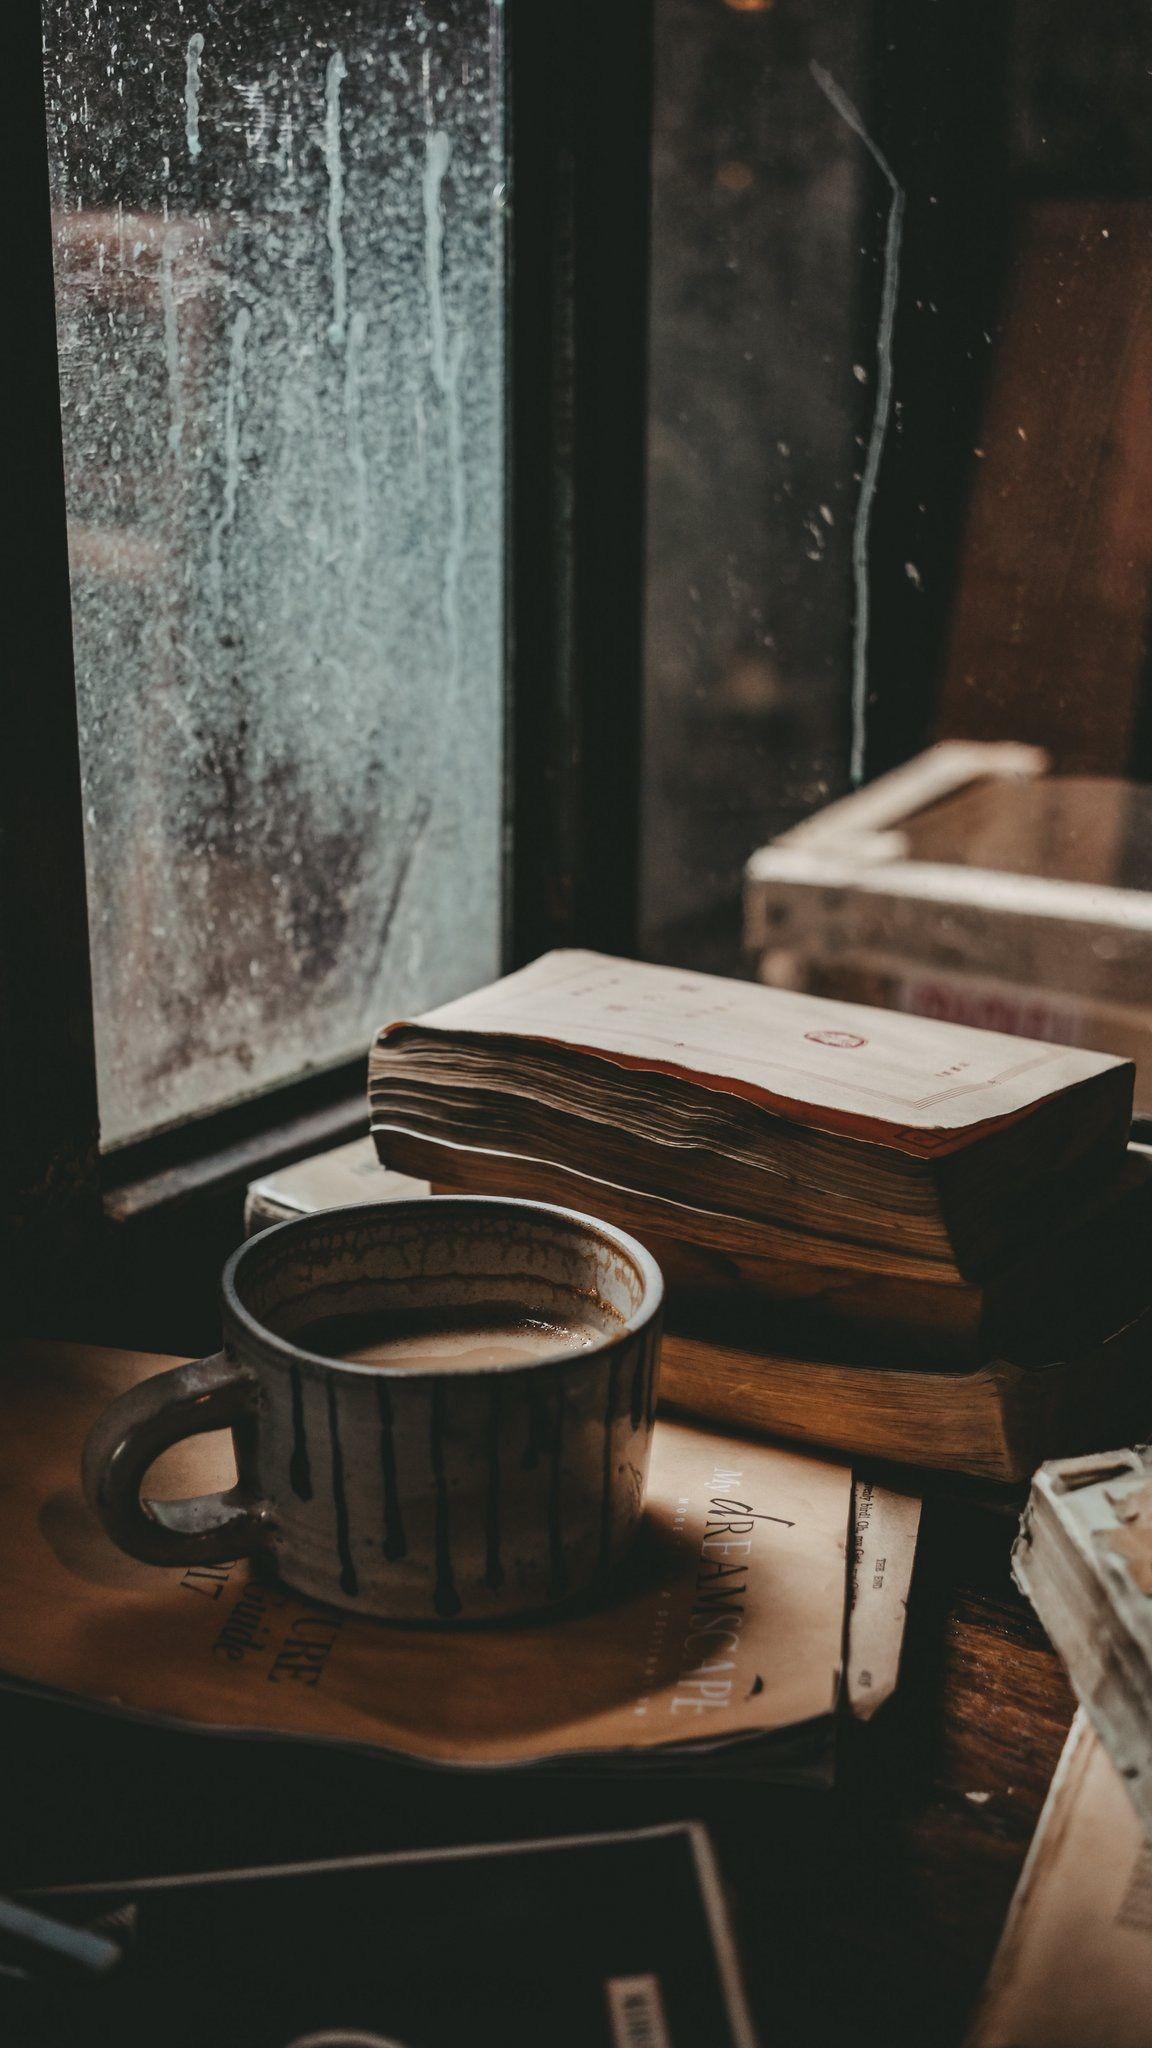 Aesthetics Coffee Cafe Cafes Books Book Livres Livre Coffeeandbooks Cafeetlivres Chill Coffee Wallpaper Iphone Book Wallpaper October Wallpaper